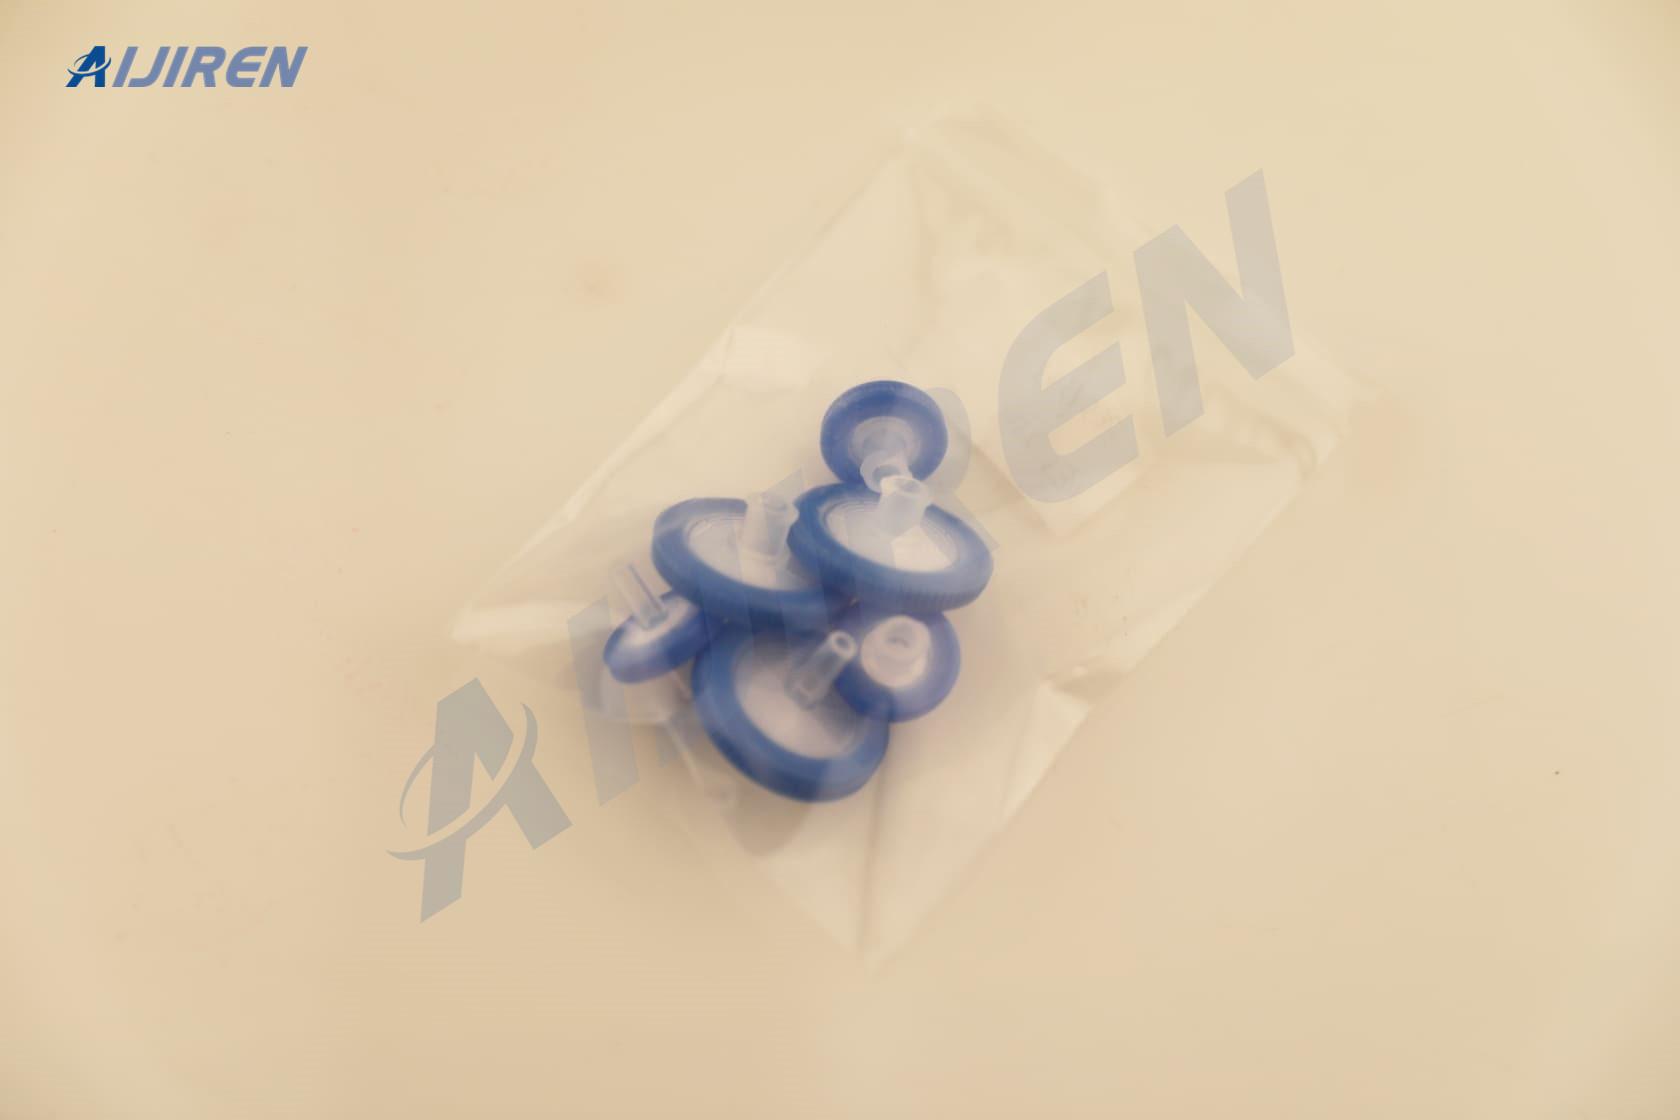 20ml headspace vialPacked Nylon Syringe Filter